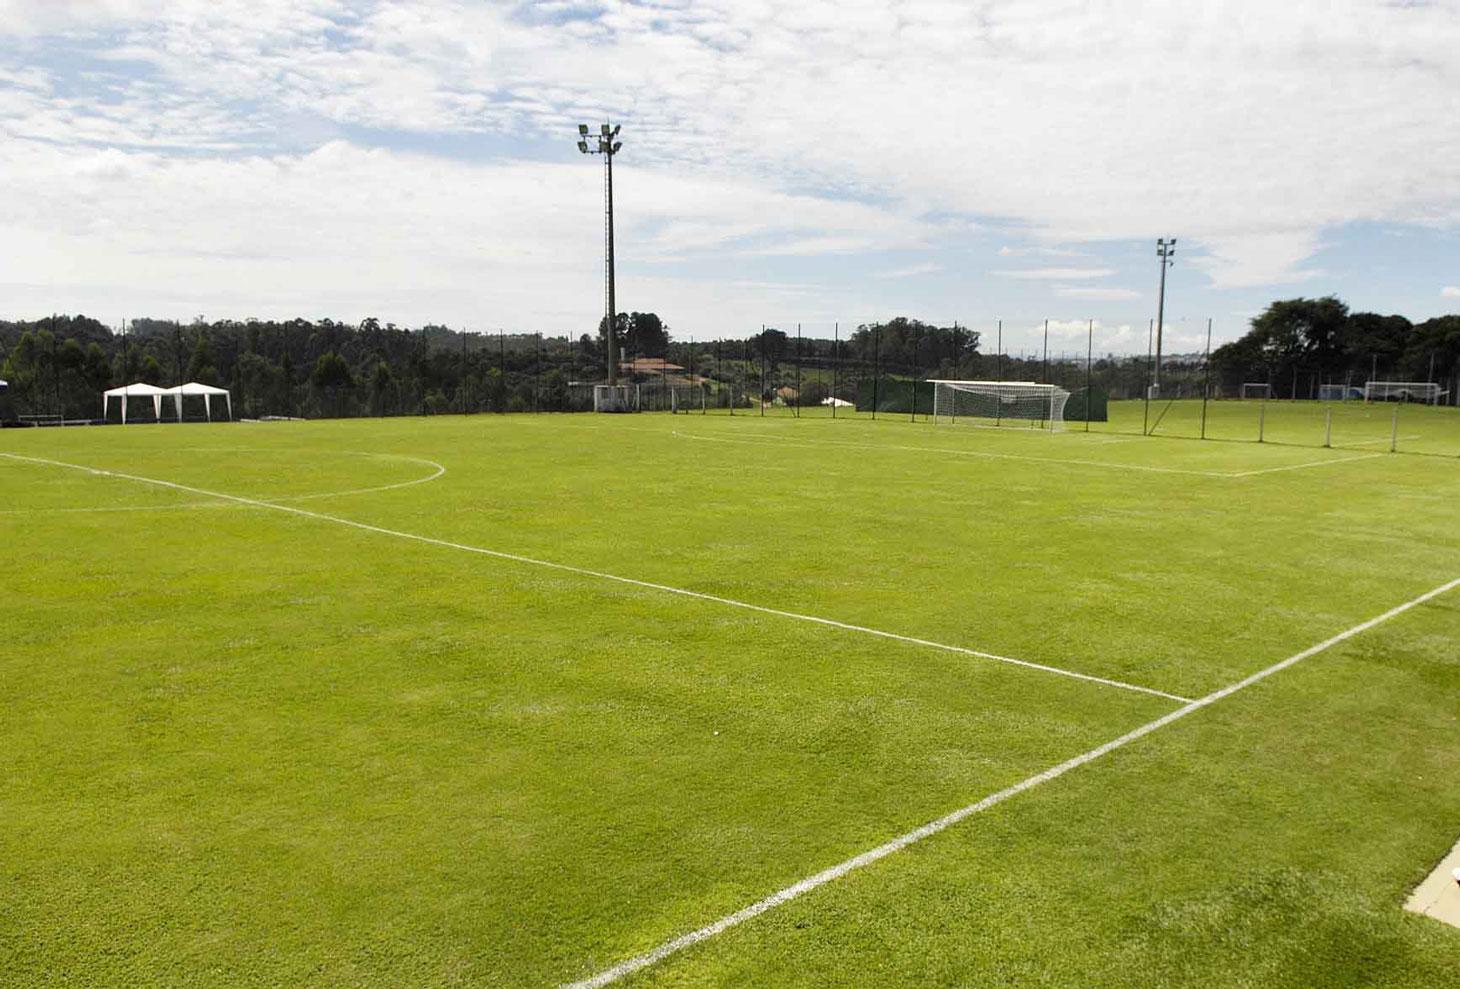 Centro Futebolístico